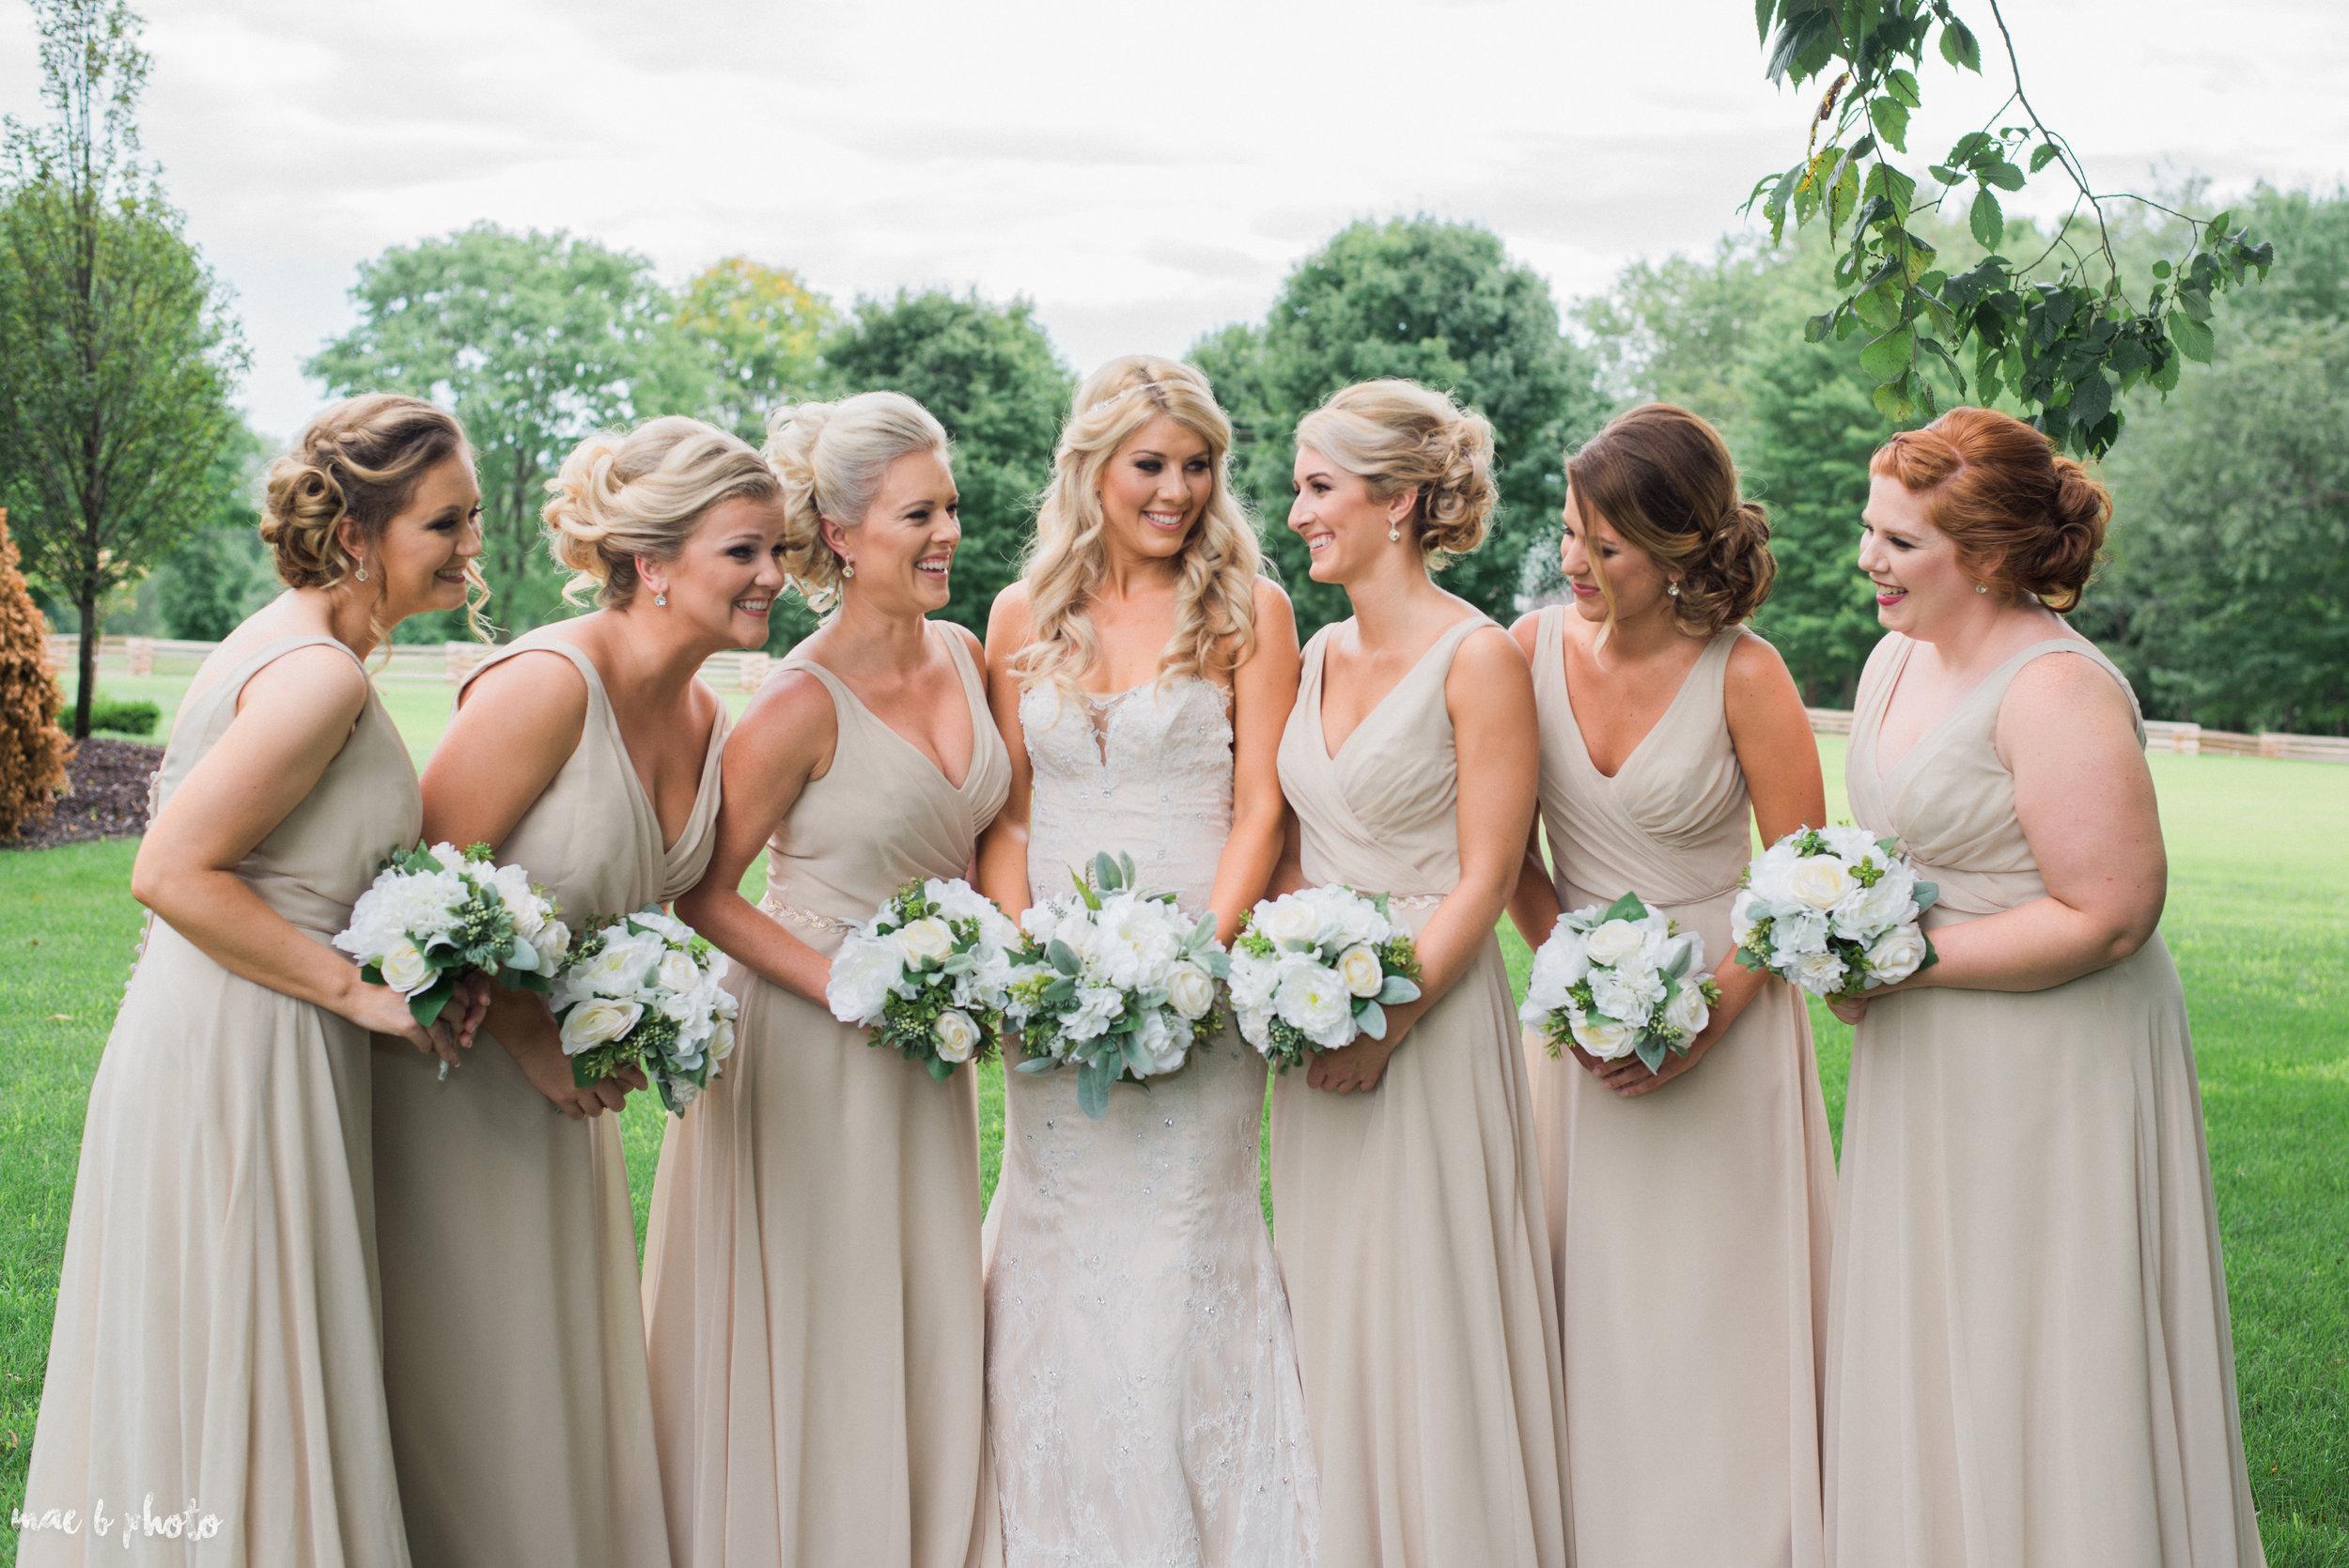 Tara & Matt's Elegant Backyard Summer Wedding in Kinsman, Ohio-50.jpg